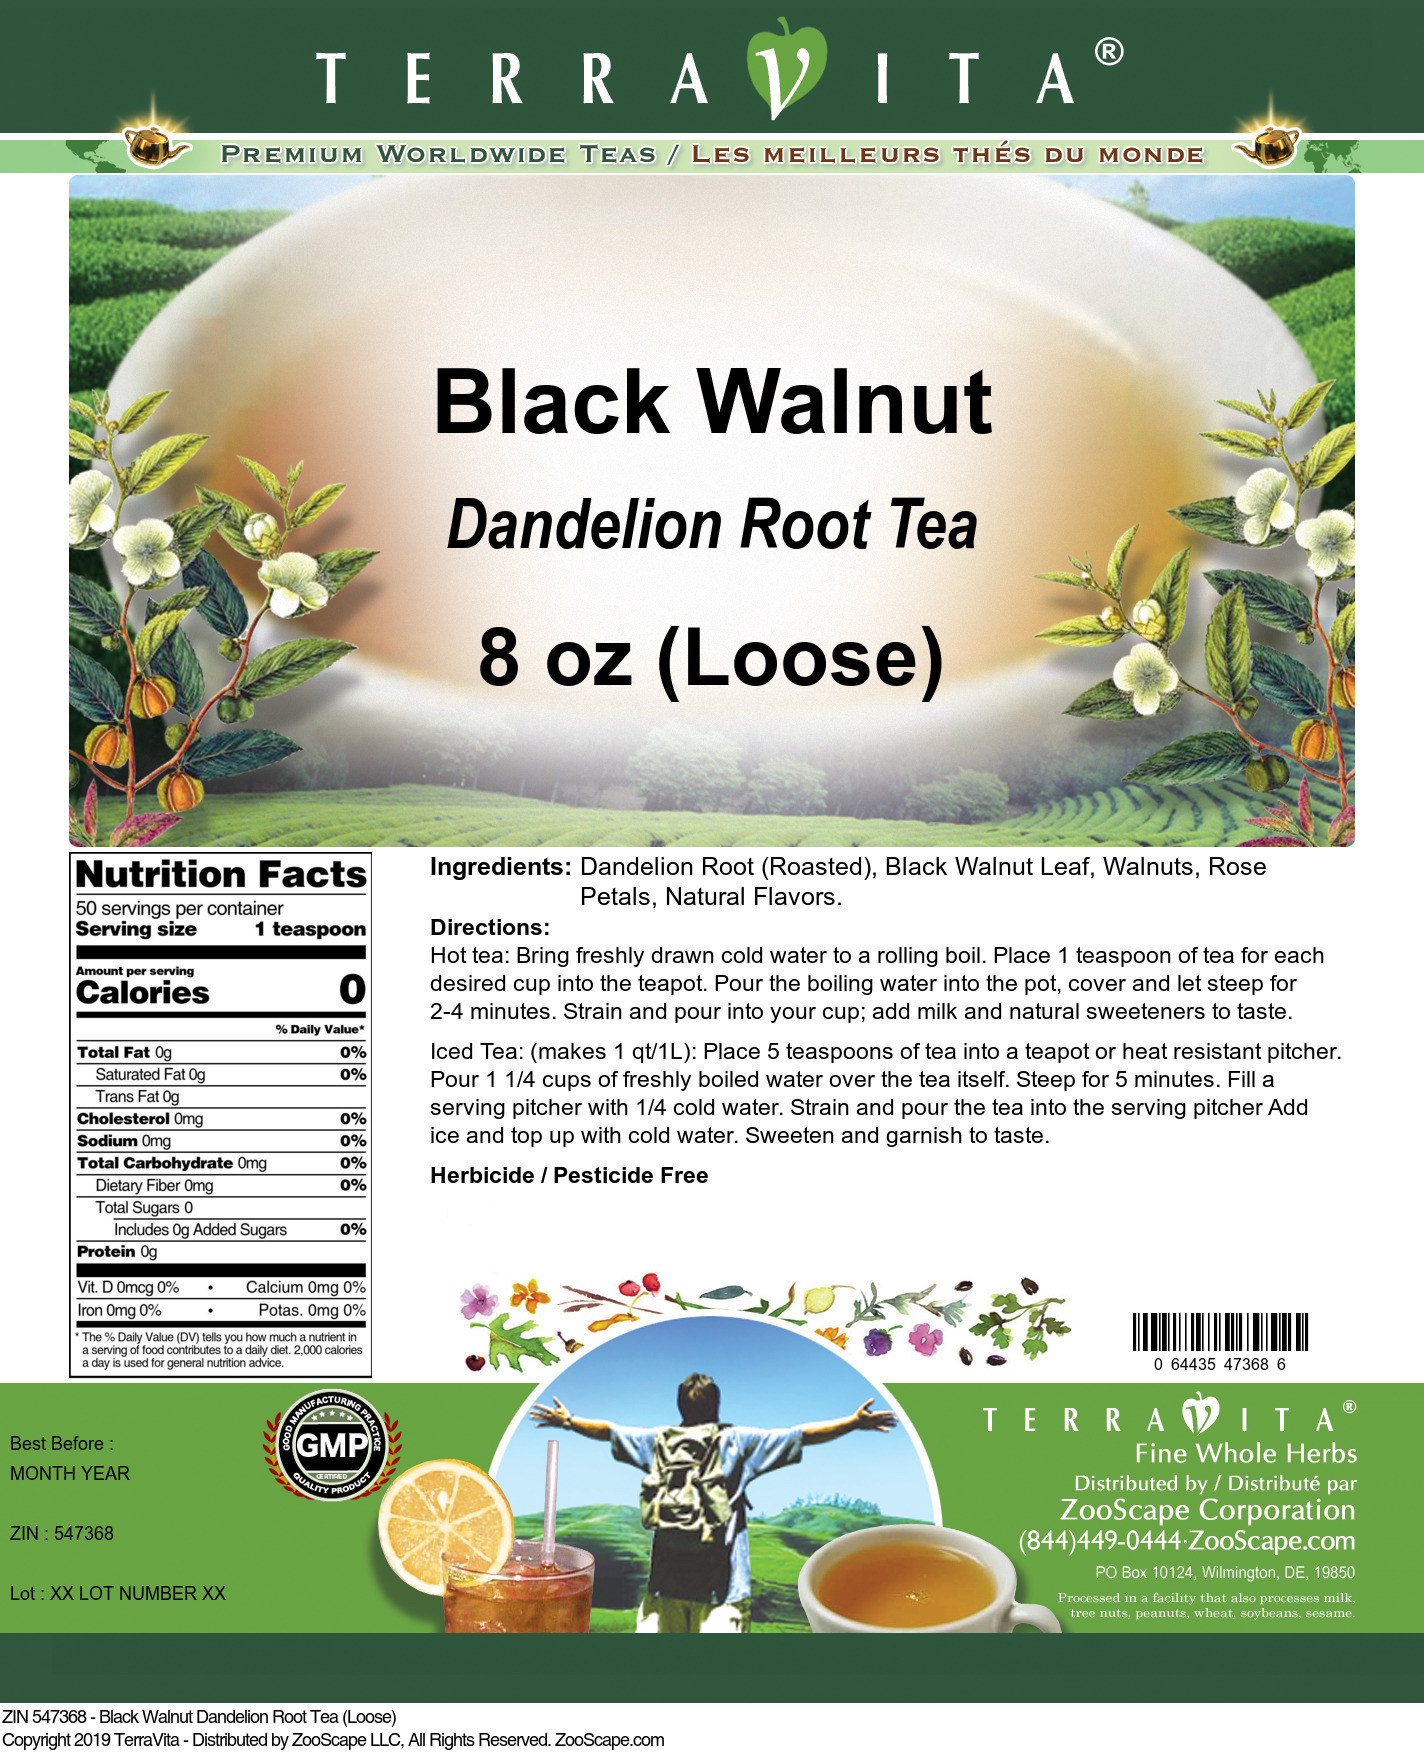 Black Walnut Dandelion Root Tea (Loose)